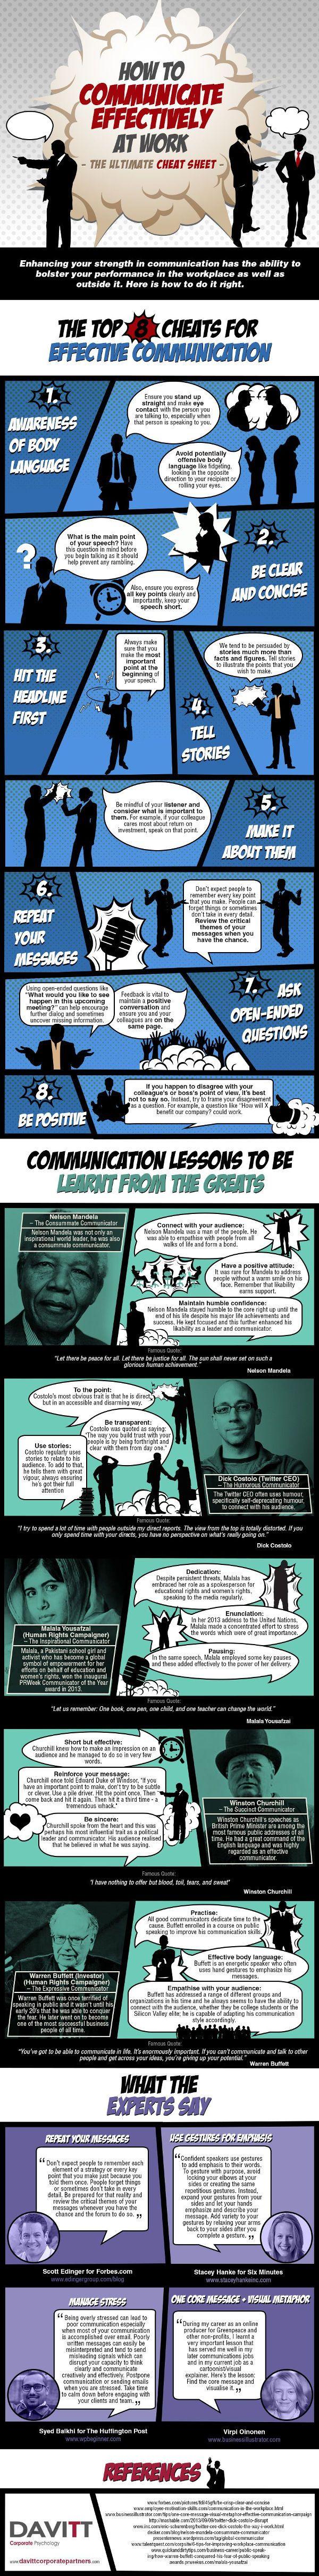 Communication Skills Infographic